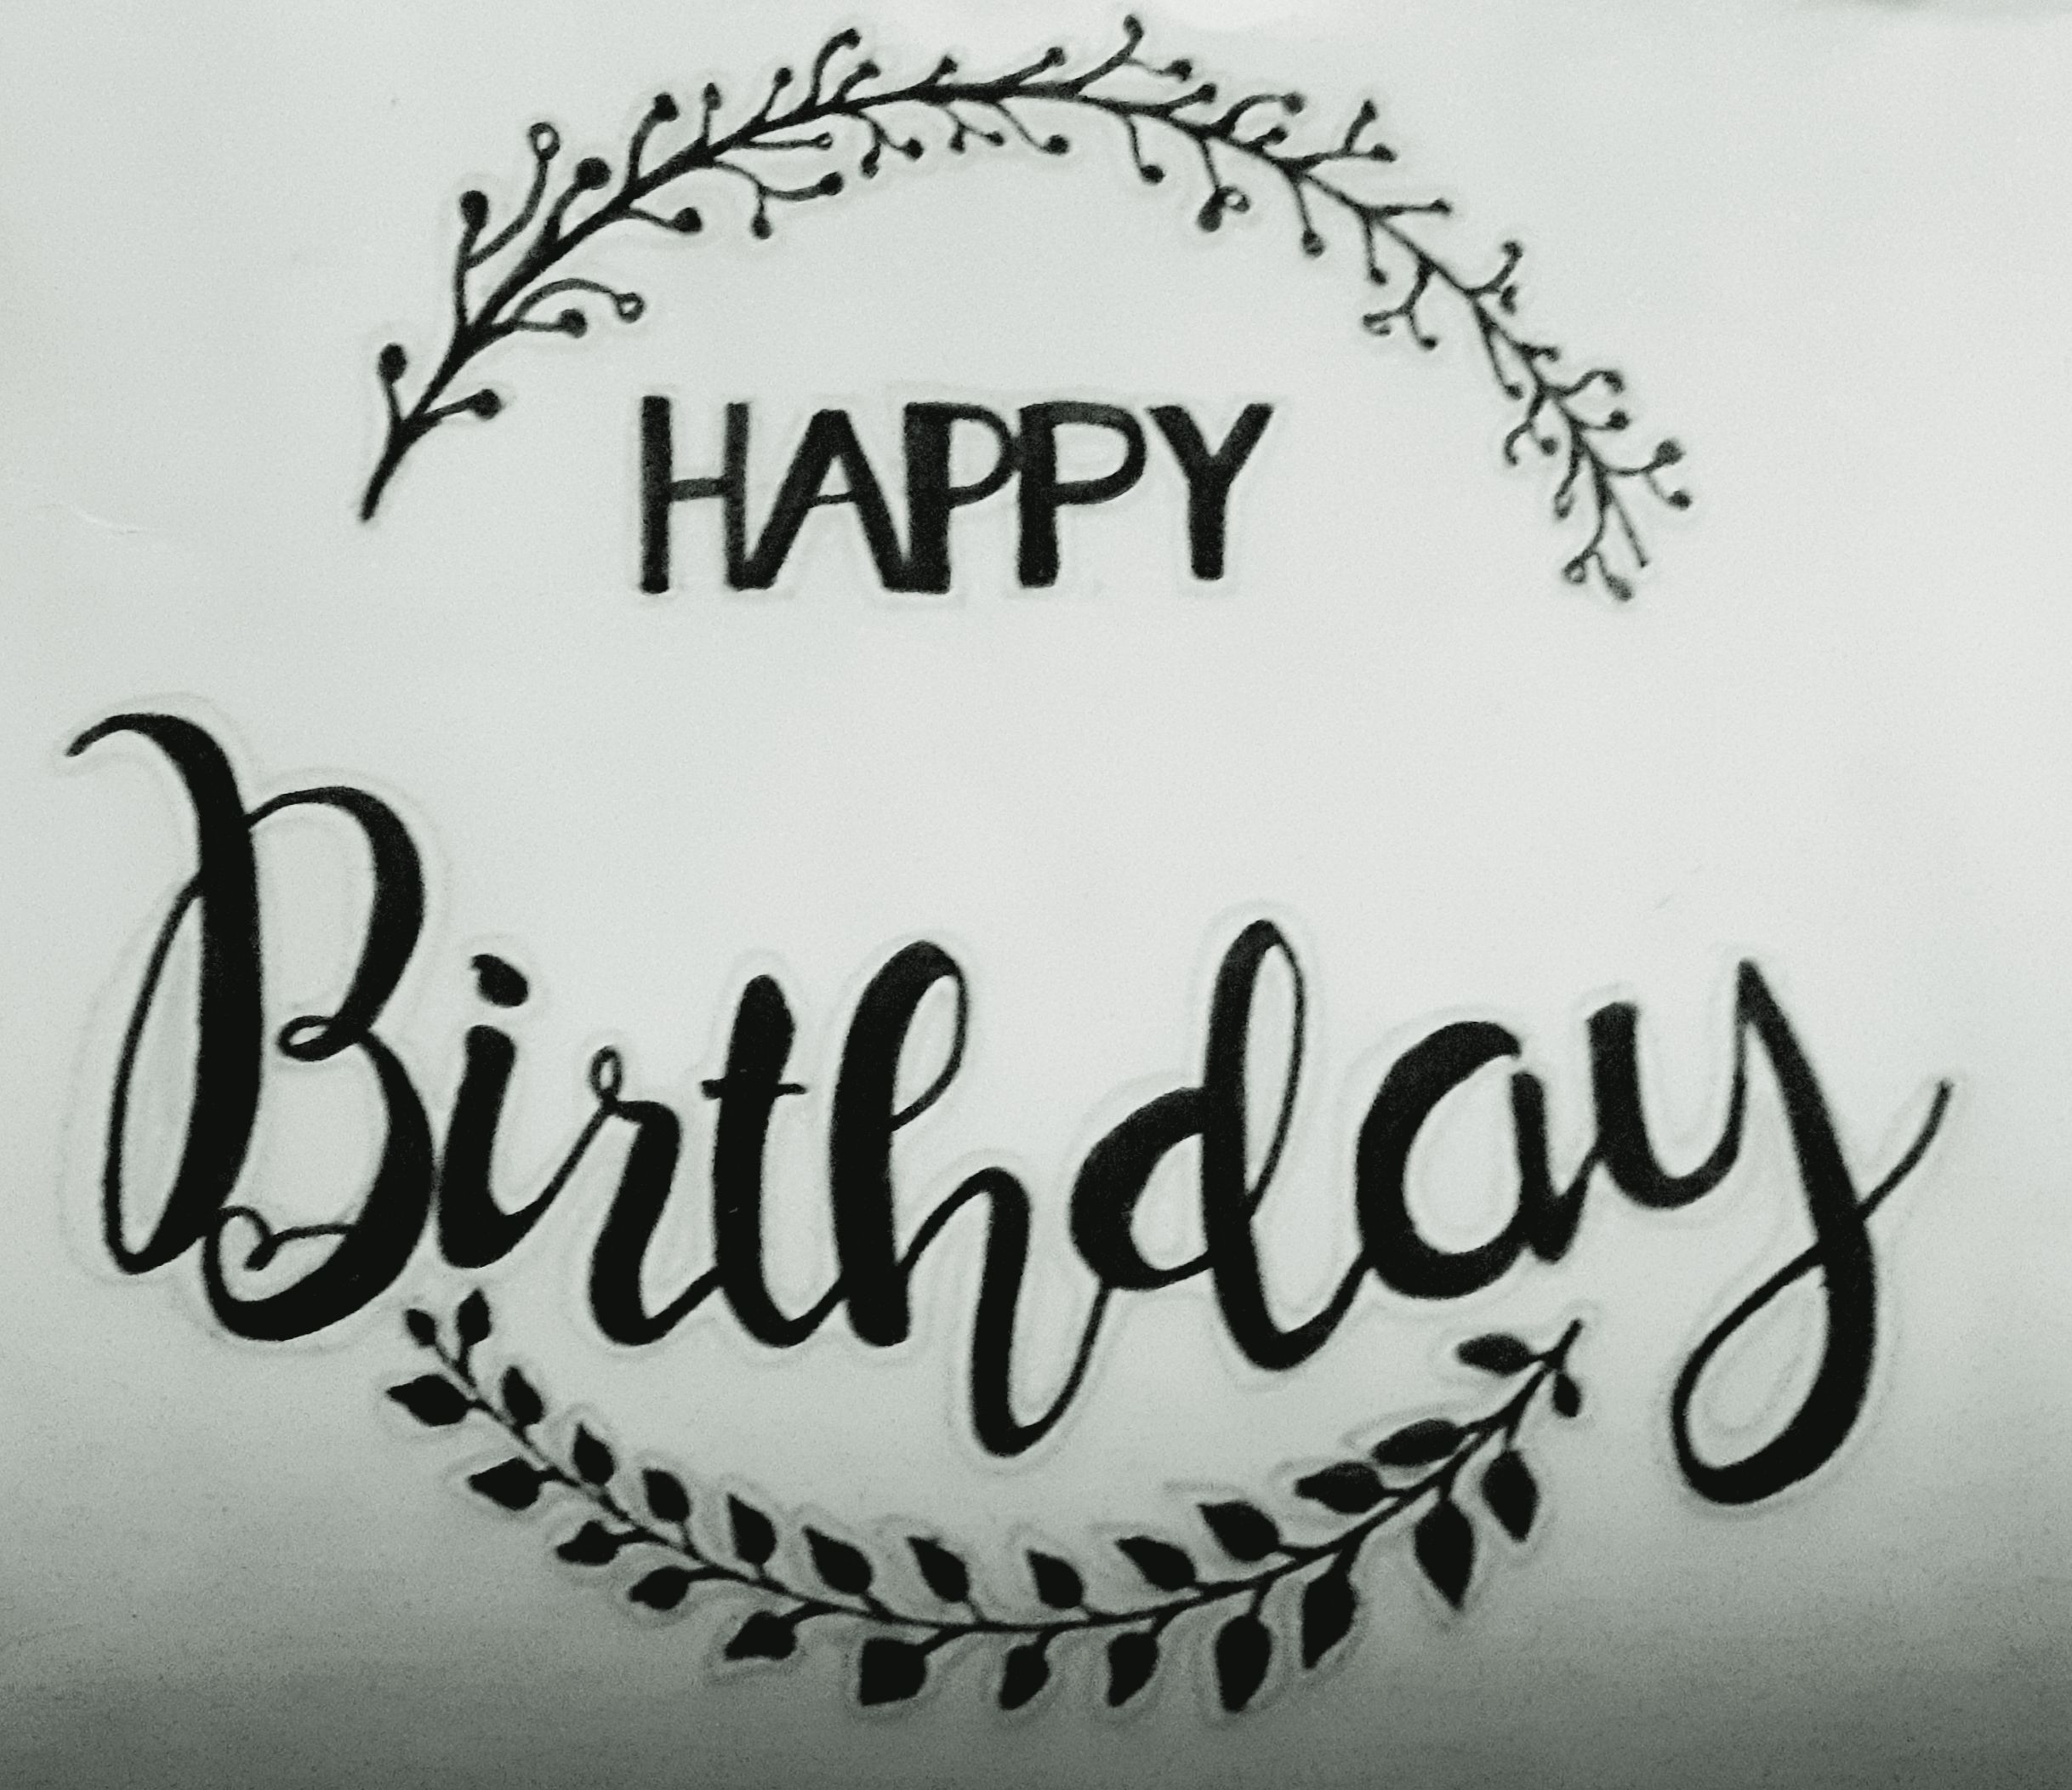 Happy Birthday Kaligrafi Jenis Huruf Tulisan Huruf Tulisan